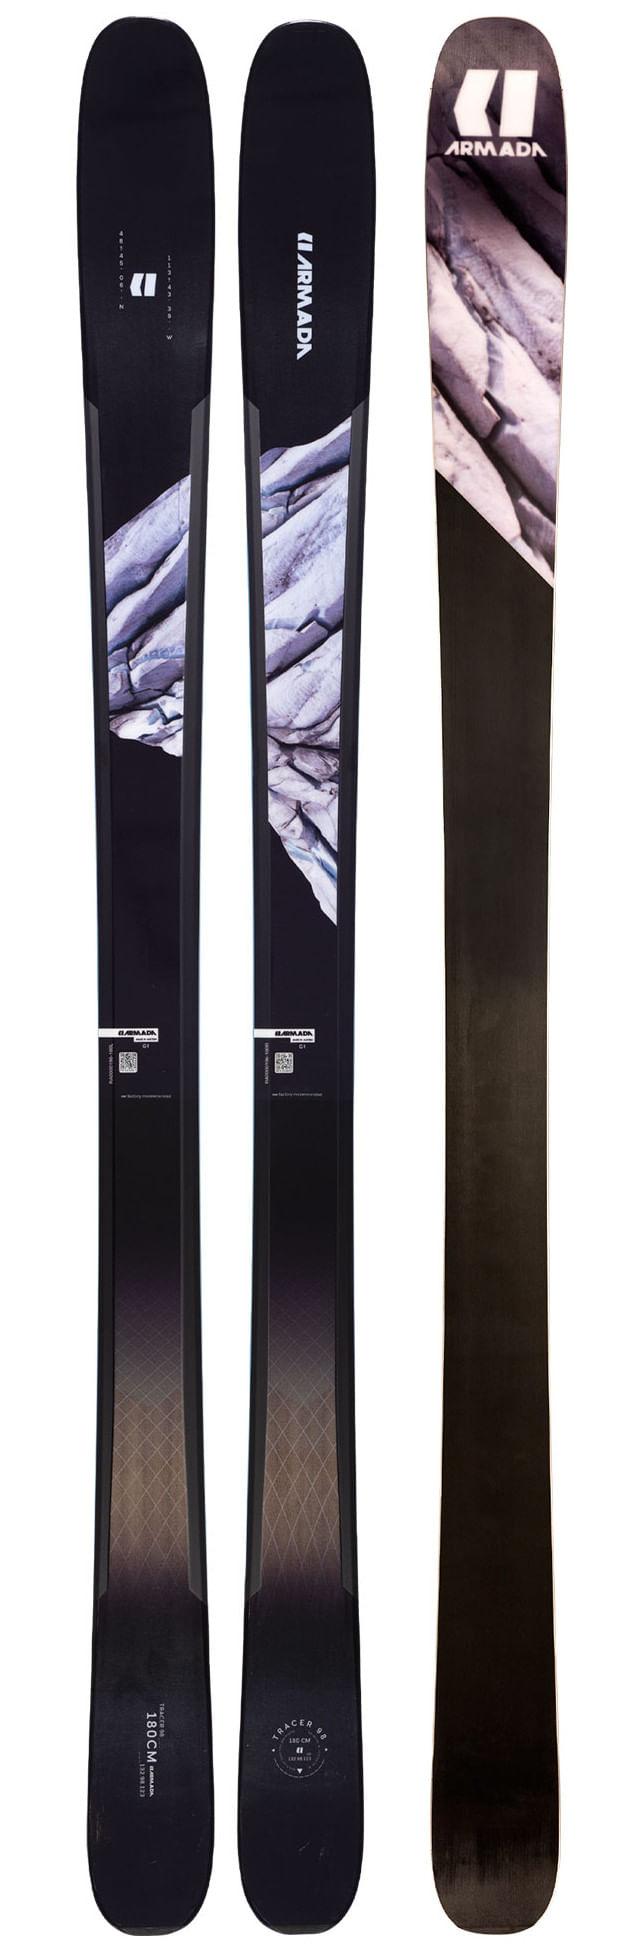 Armada-Tracer-98-Skis-2021